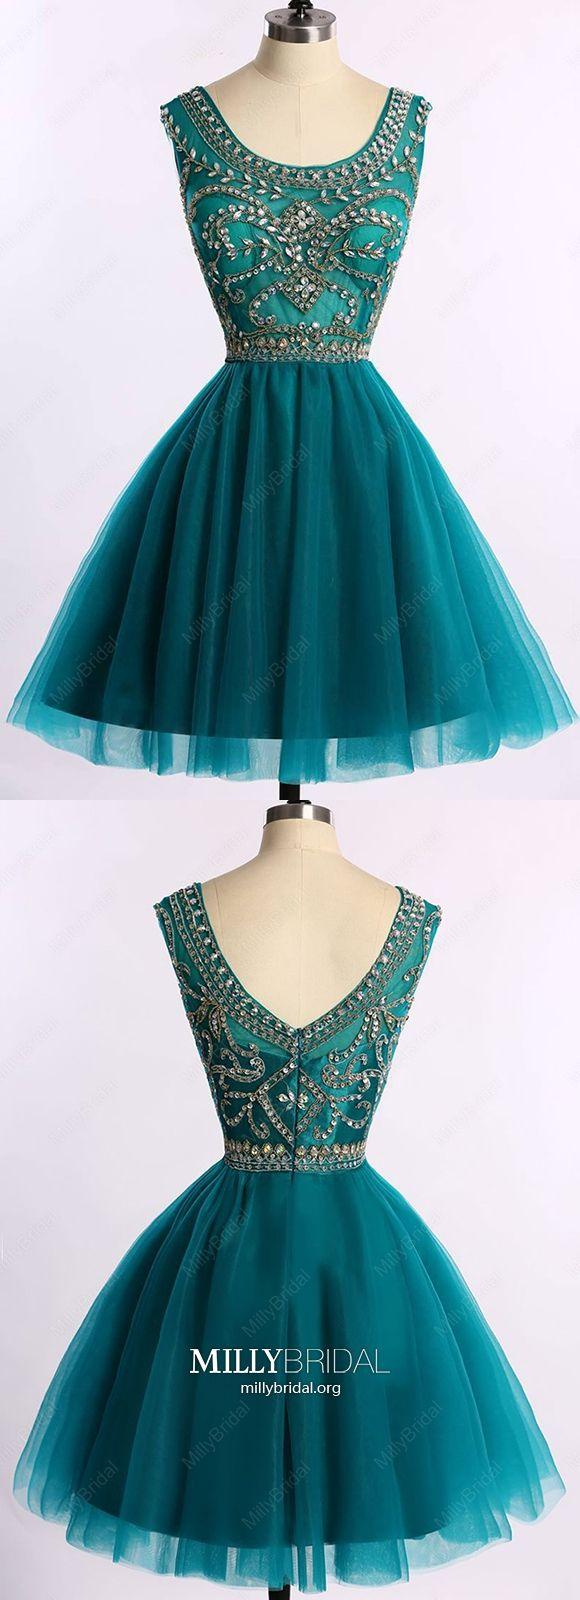 Dark green homecoming dresses short modest prom dresses sparkly